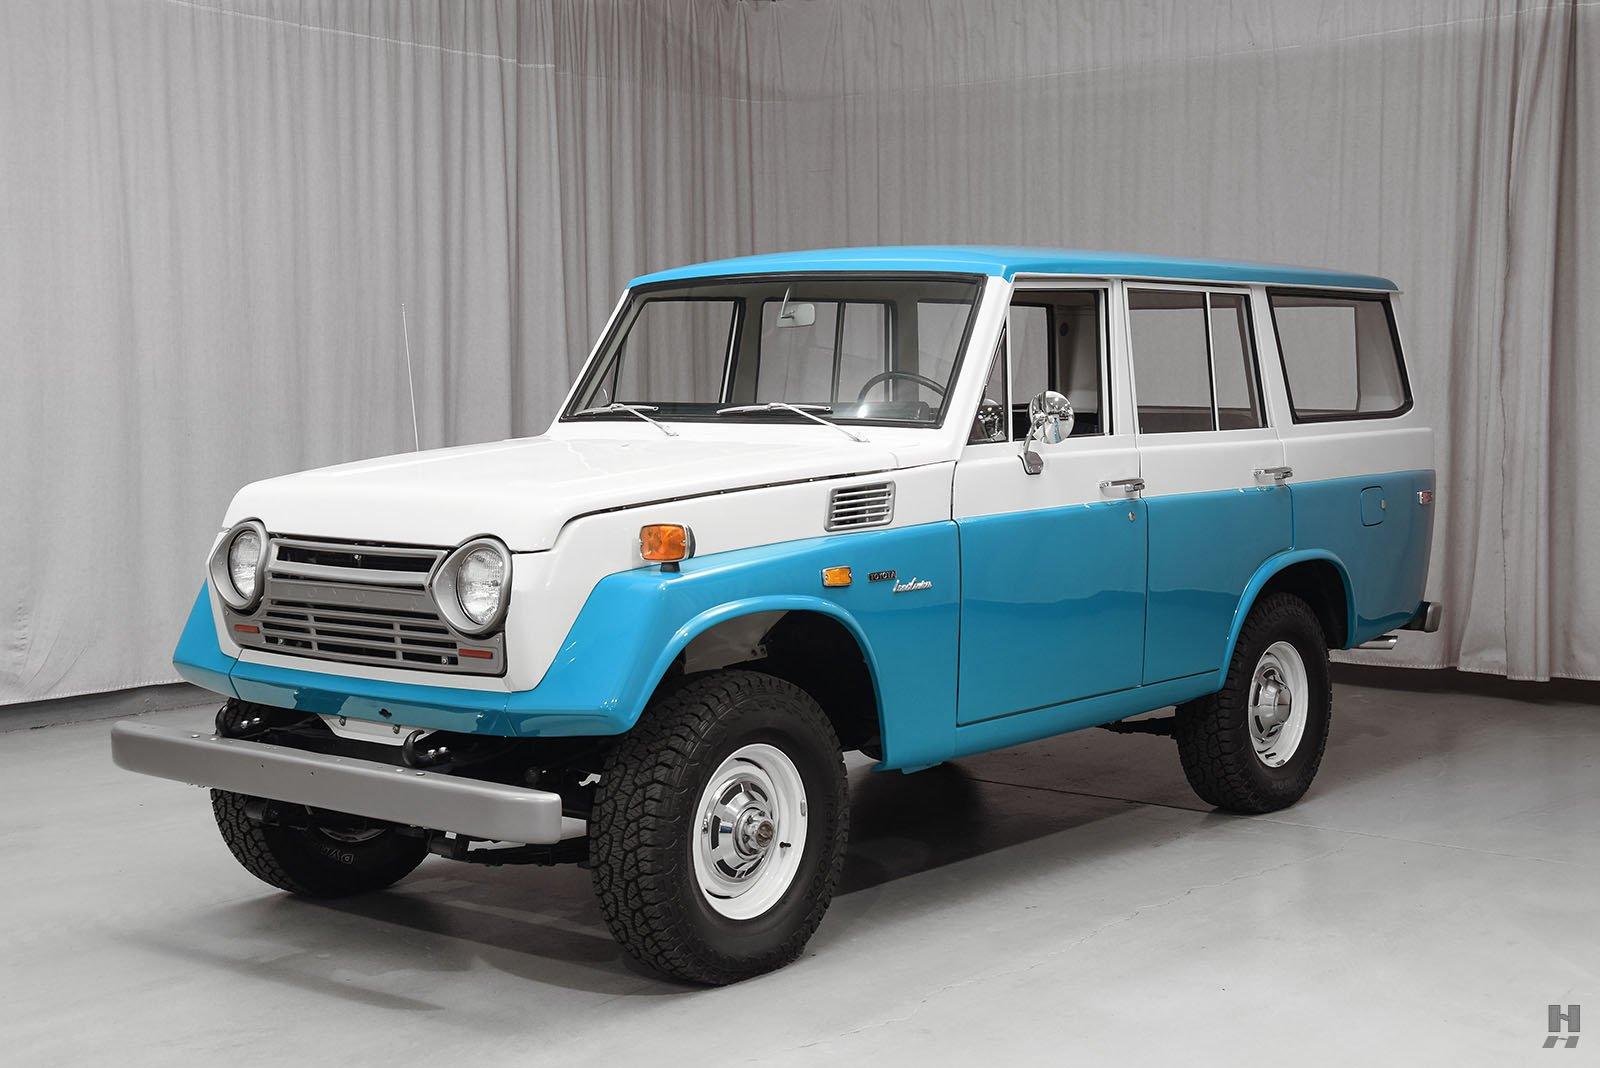 Fj Cruiser 2017 Update Upcoming Cars 2020 Toyota Mega In Usa 1972 Fj55 Land Hyman Ltd Classic